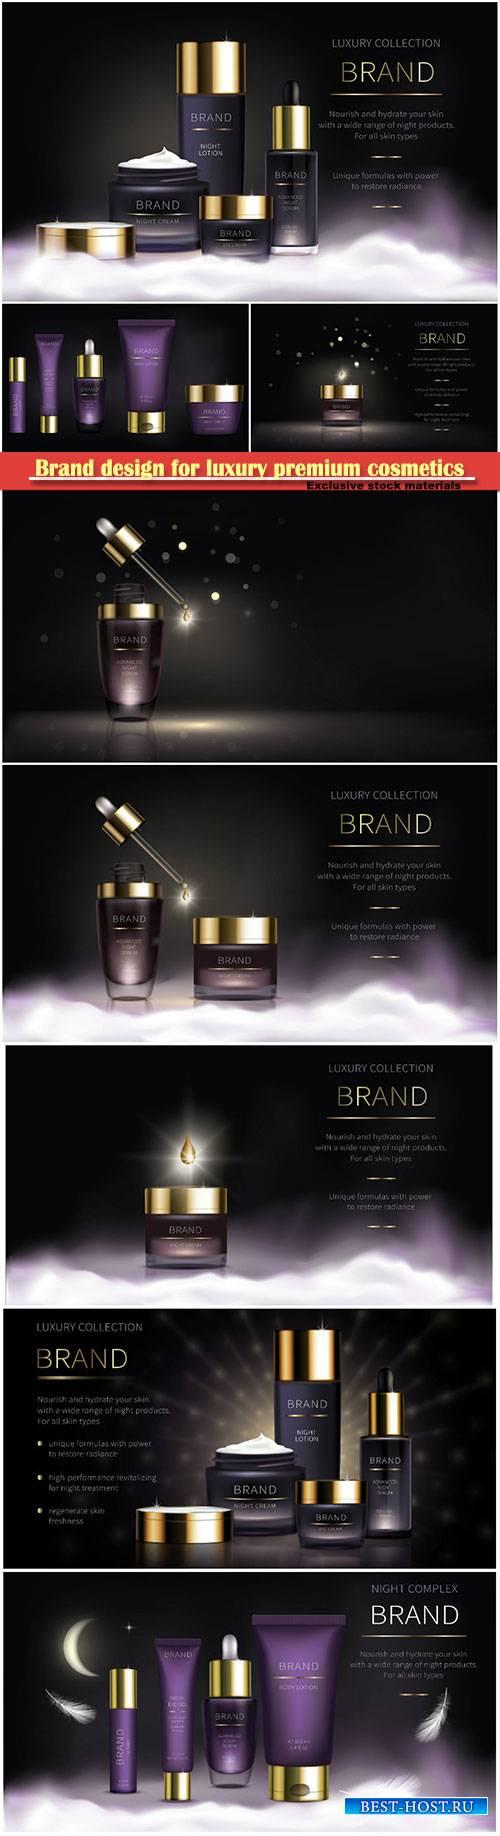 Brand design for luxury premium cosmetics, series for face skin care, reali ...